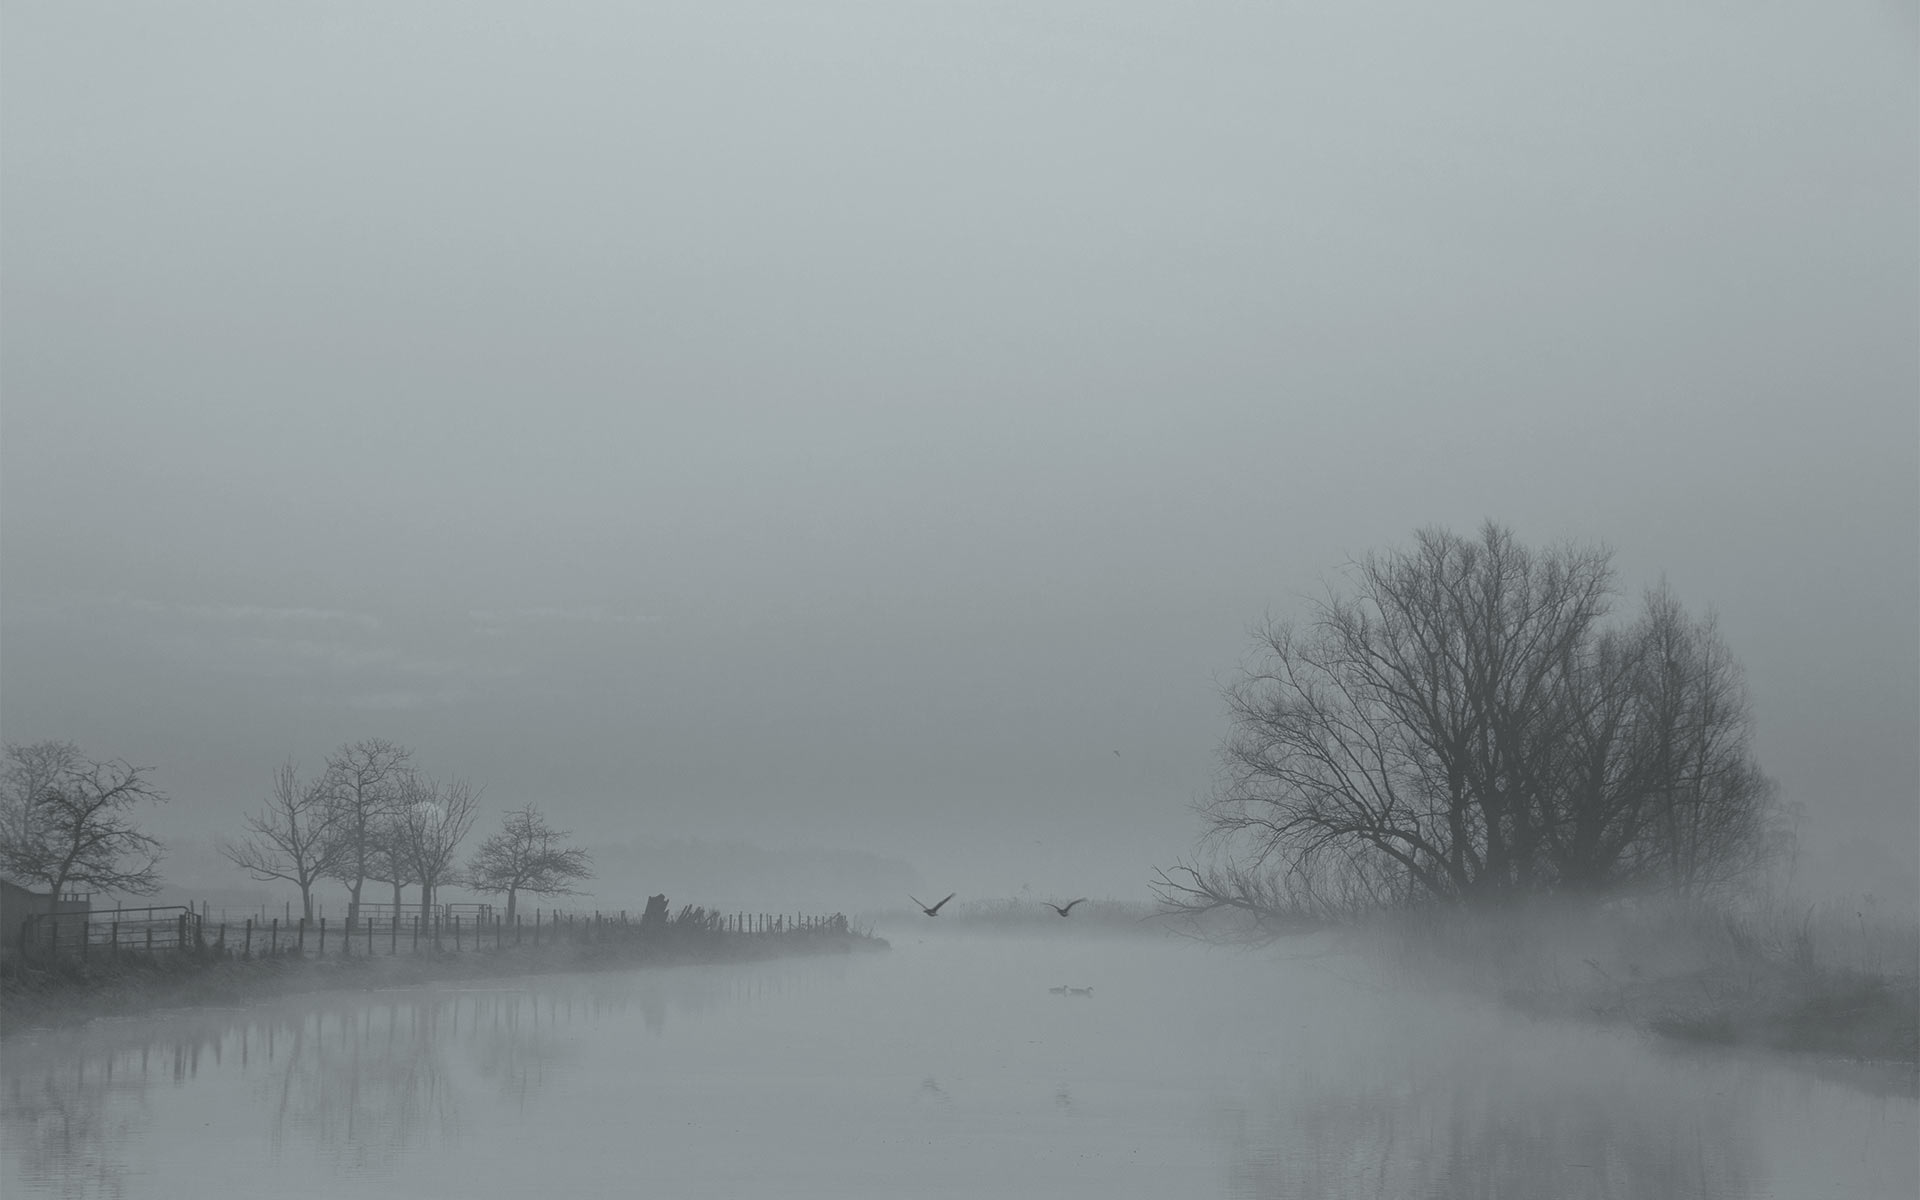 I AM LANDSCAPE PHOTOGRAPHER